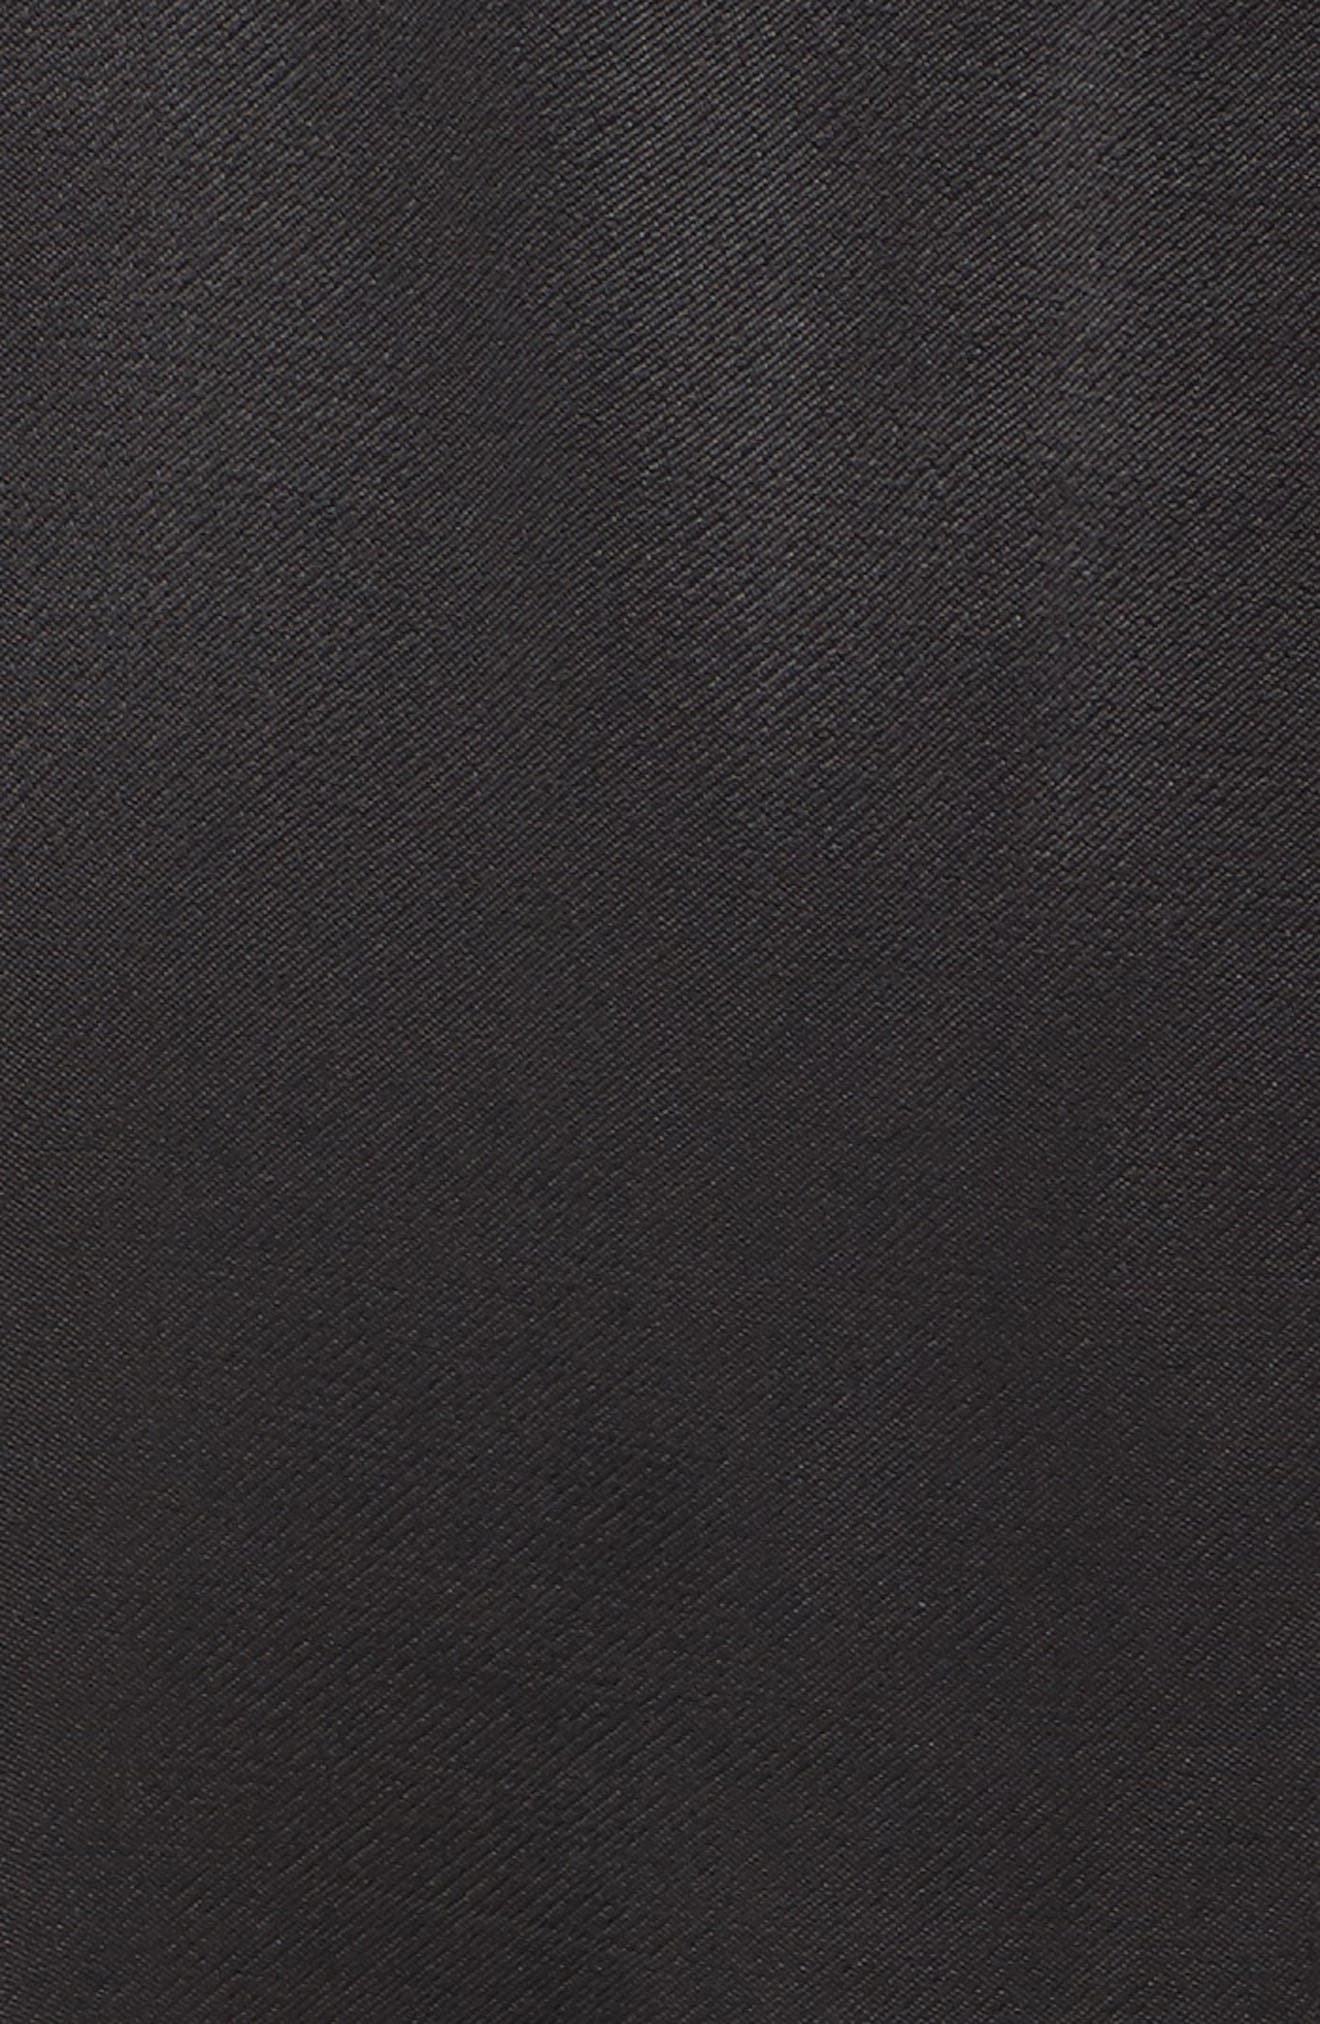 Cassia Ruffle Trim Shirtdress,                             Alternate thumbnail 5, color,                             Black